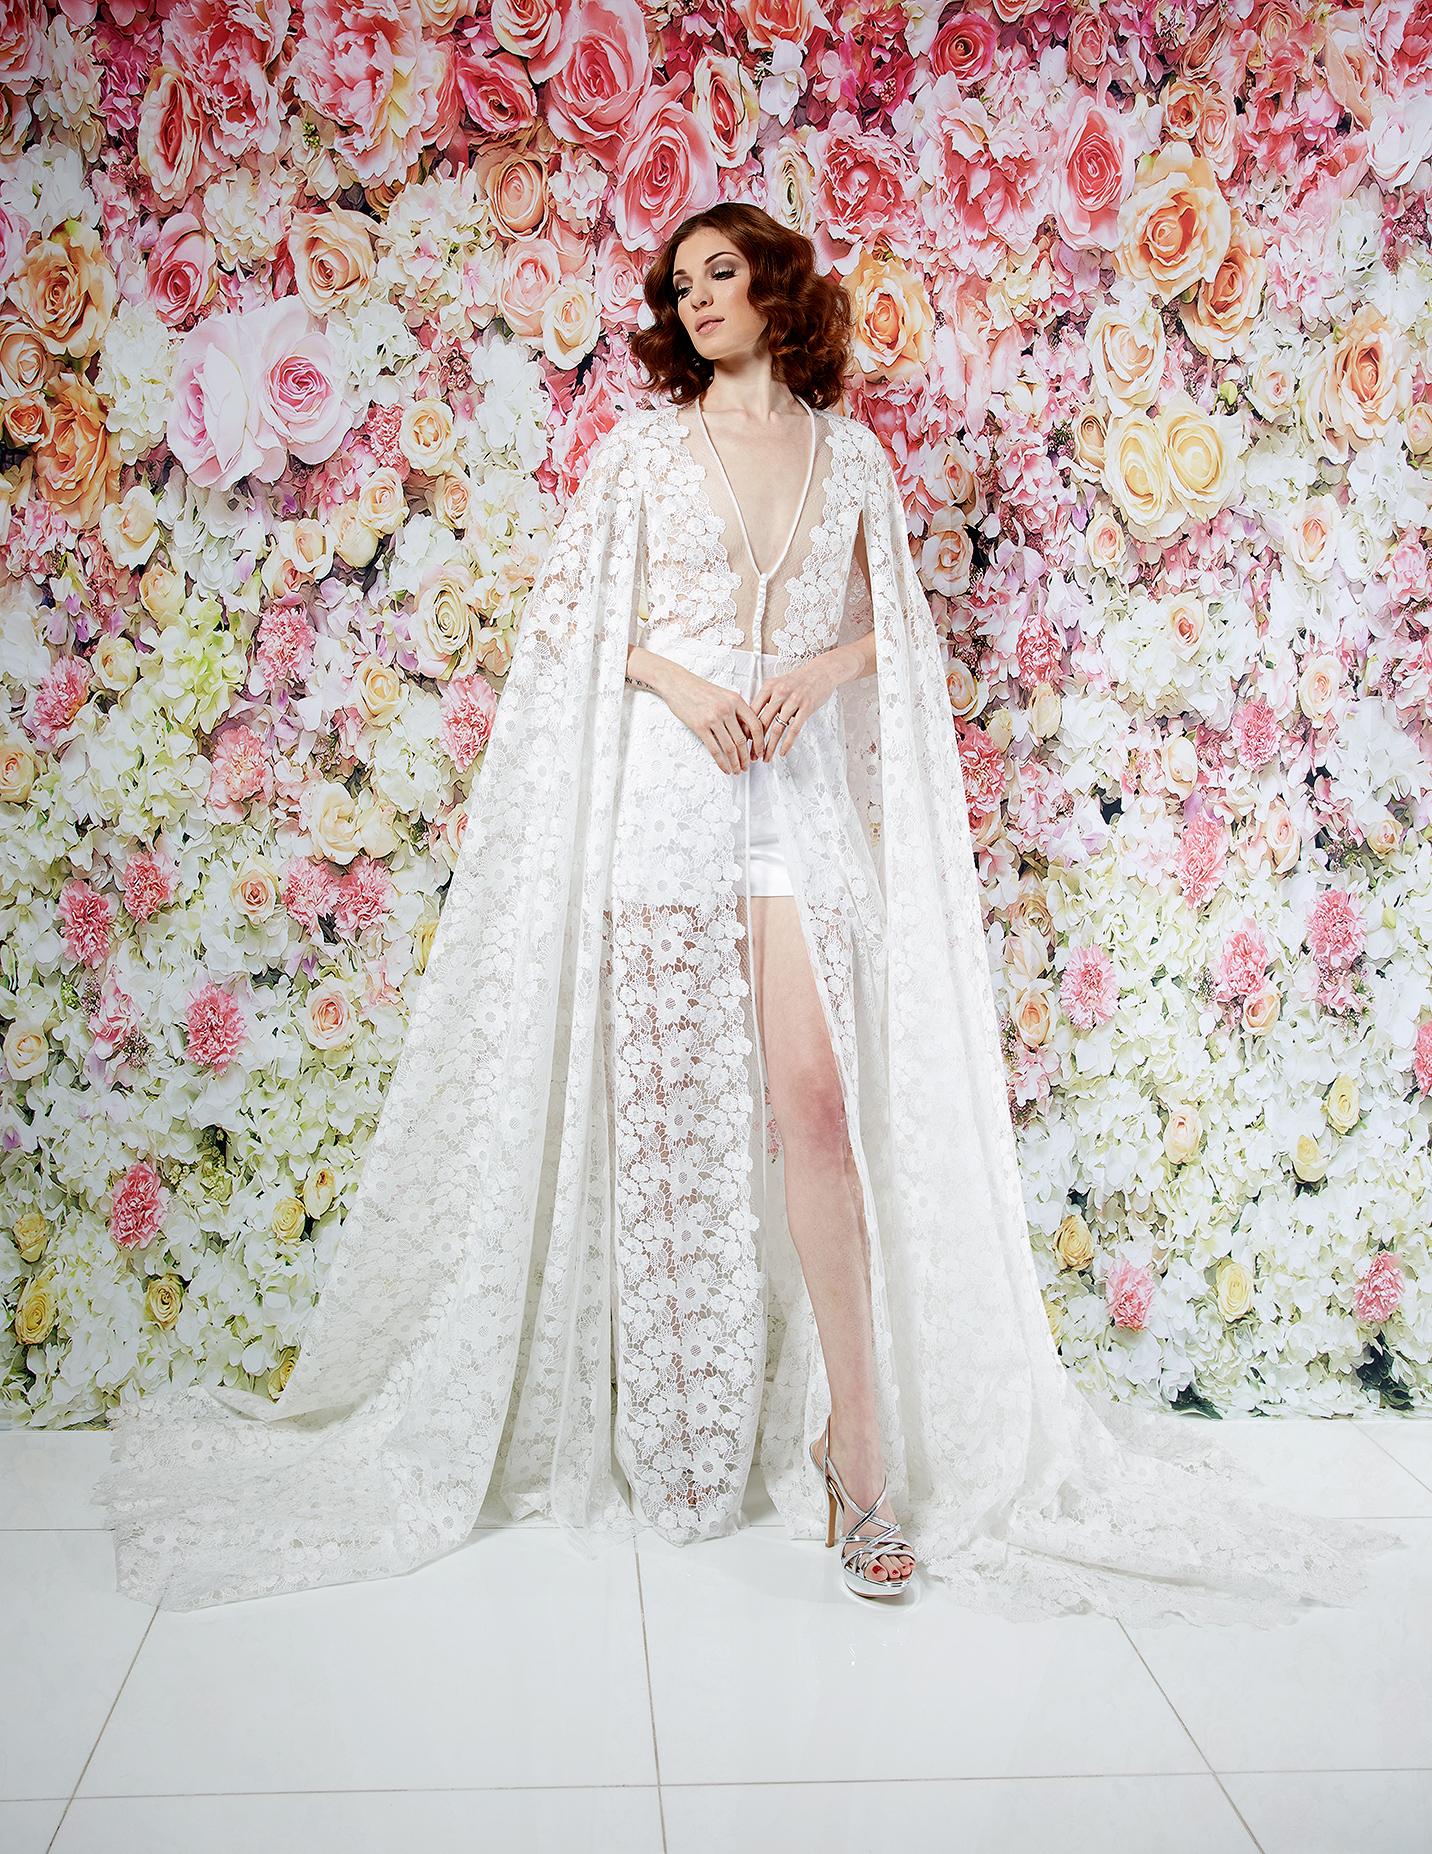 randi rahm wedding dress spring 2019 shorts sheer lace overlay separates